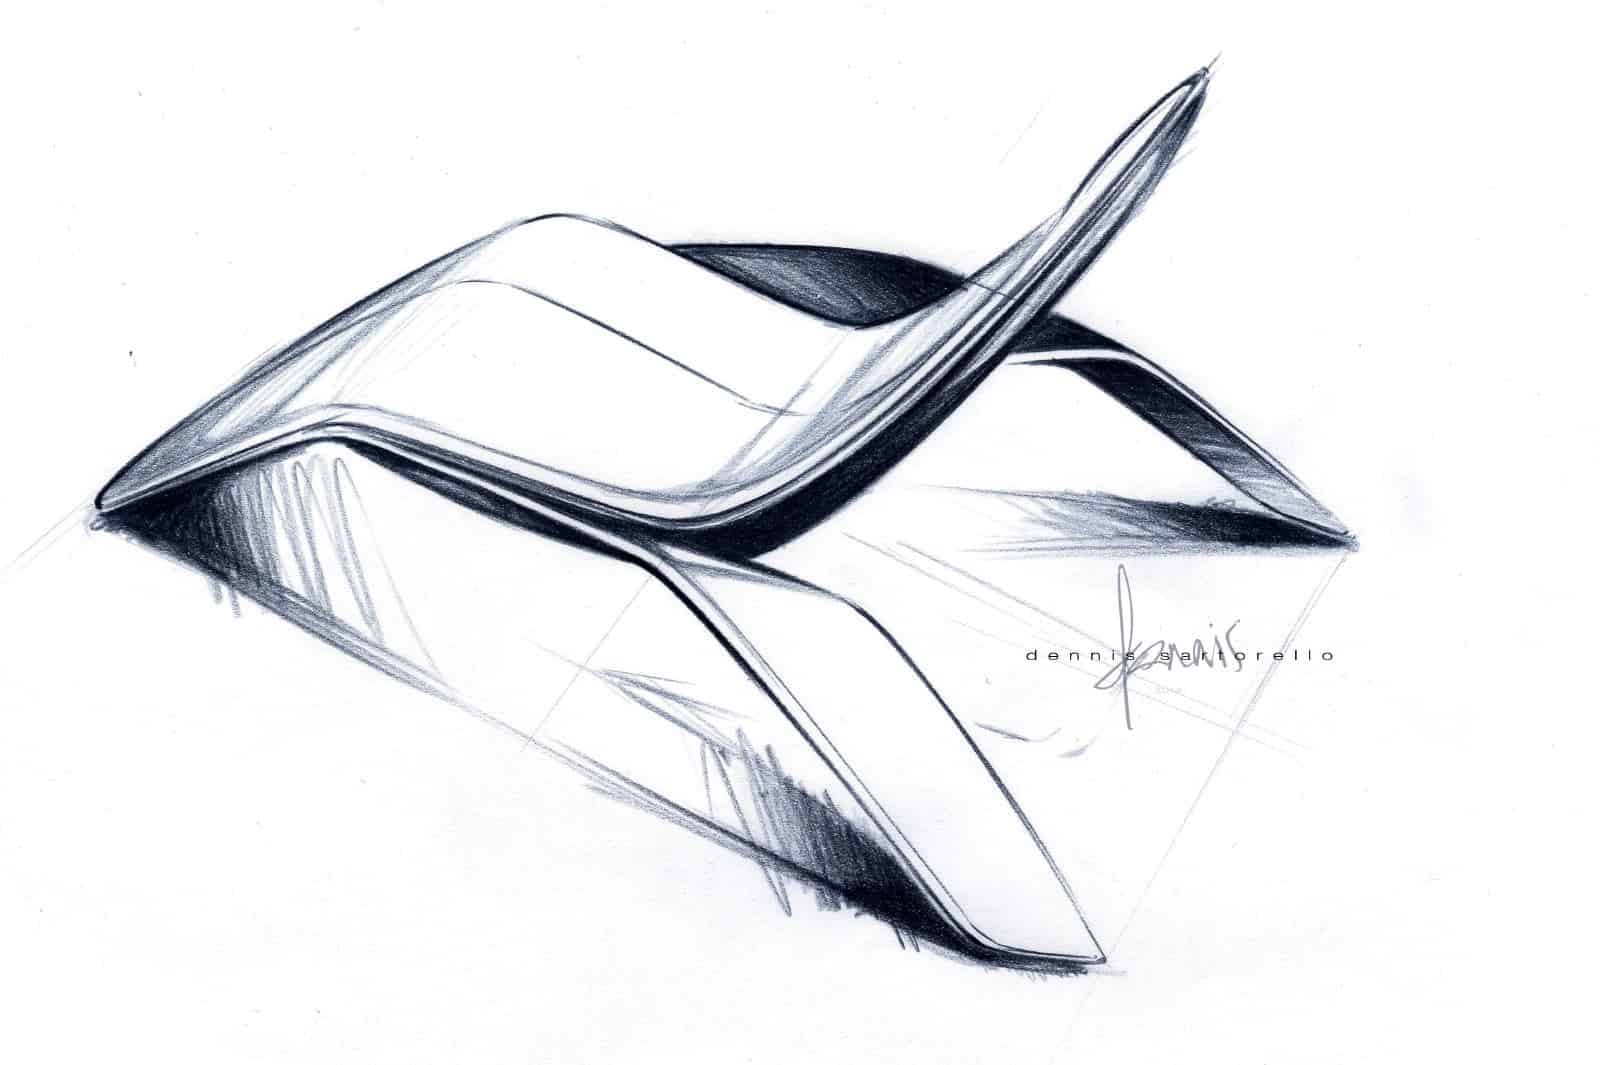 Industrial design sketches furniture - Industrial Design Sketches Furniture 55